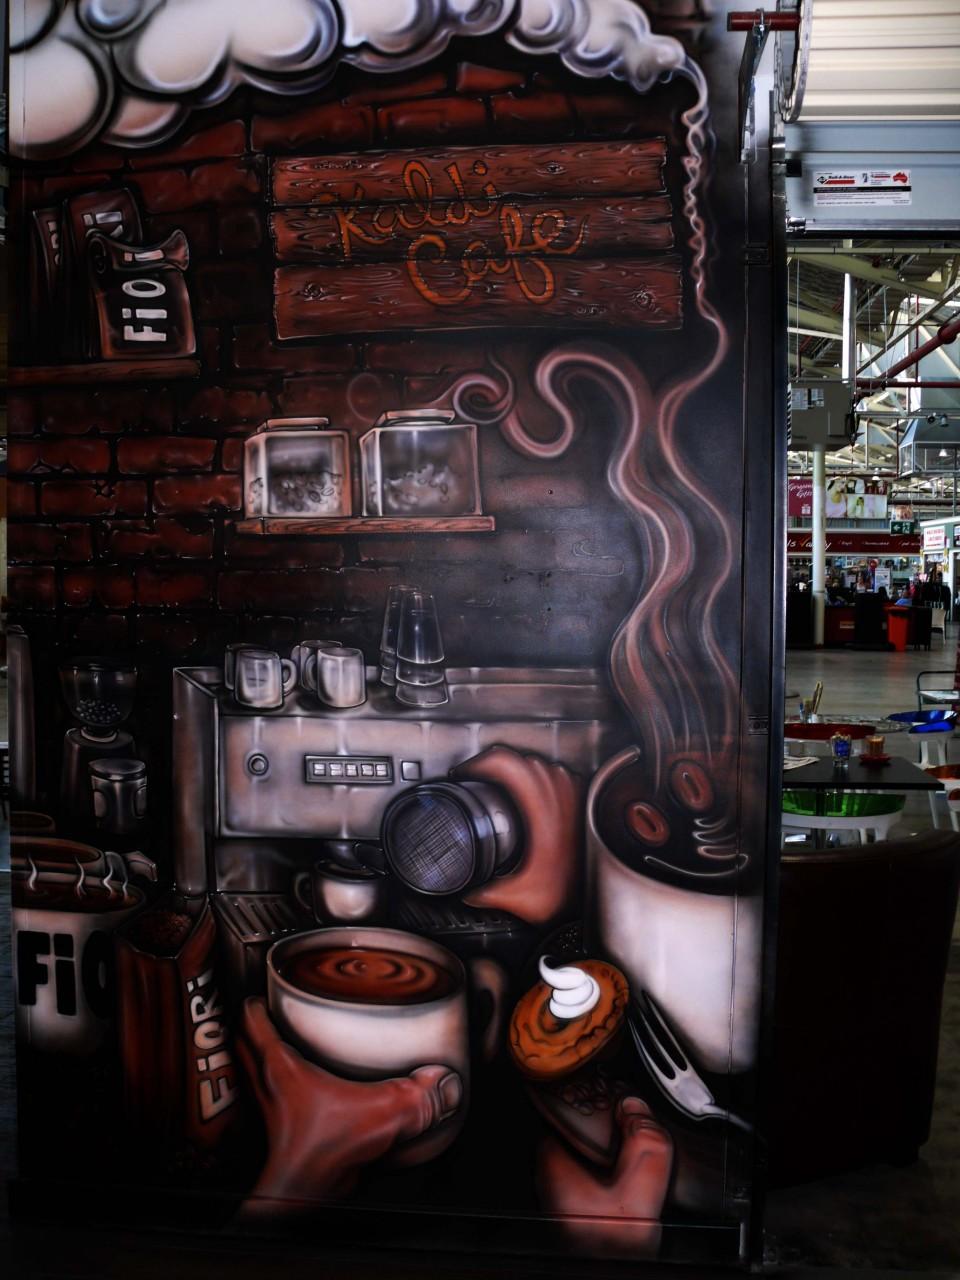 airbrush art-airbrush art perth-airbrush perth-airbrush murals-airbrush signs-signs-airbrush graphics-Kaldi Cafe8